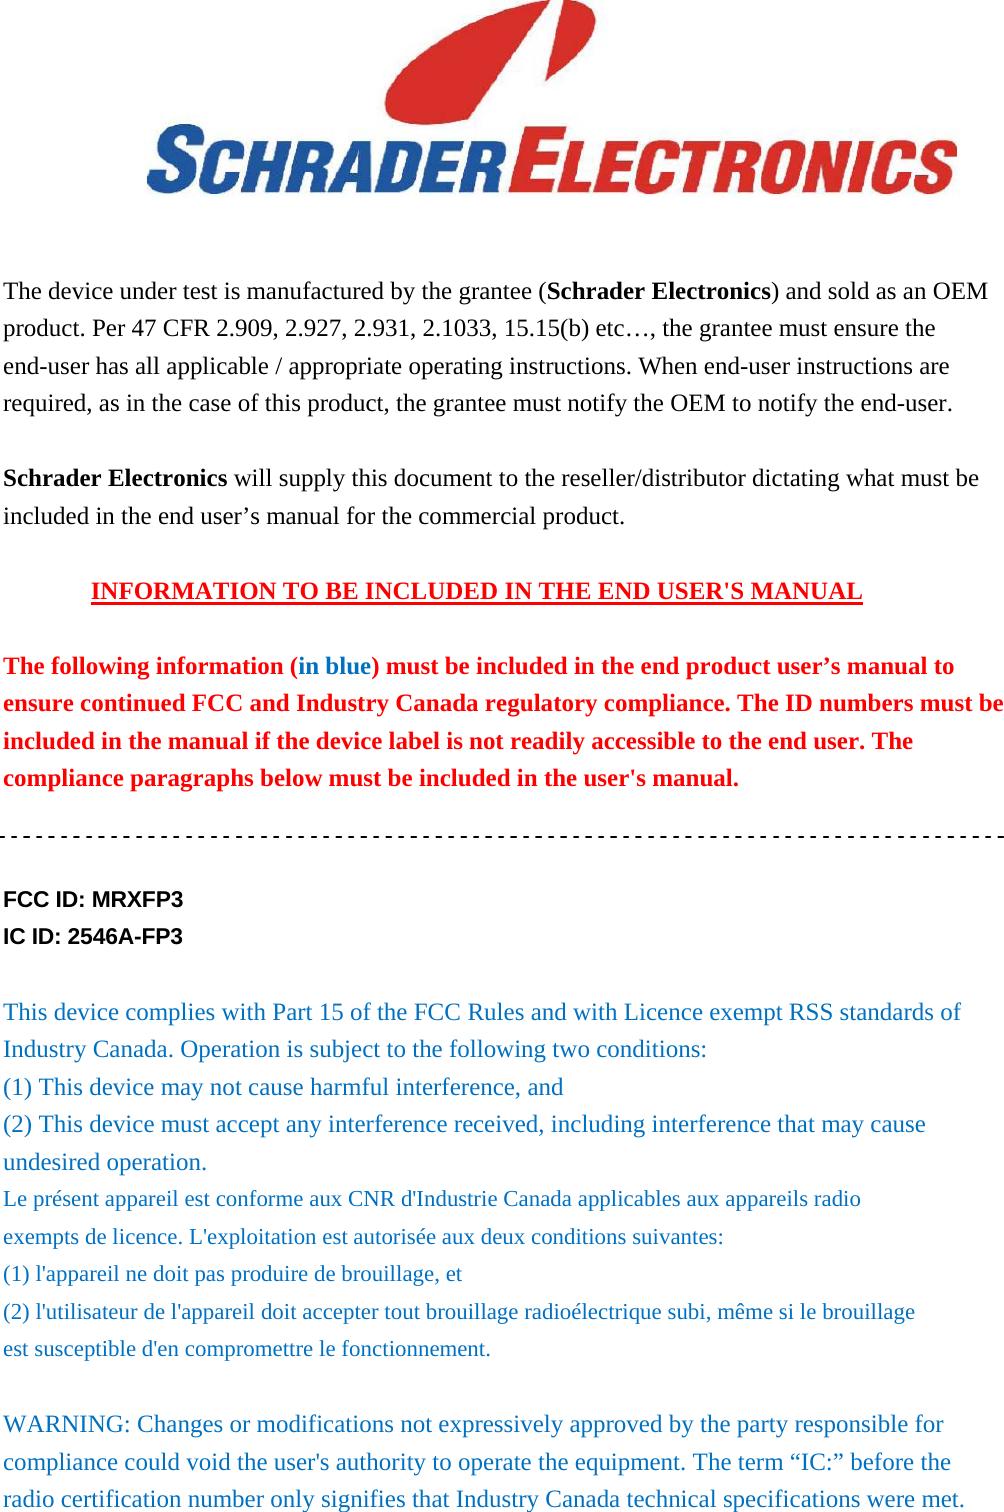 Schrader Electronics FP3 Tyre Pressure Monitoring Sensor